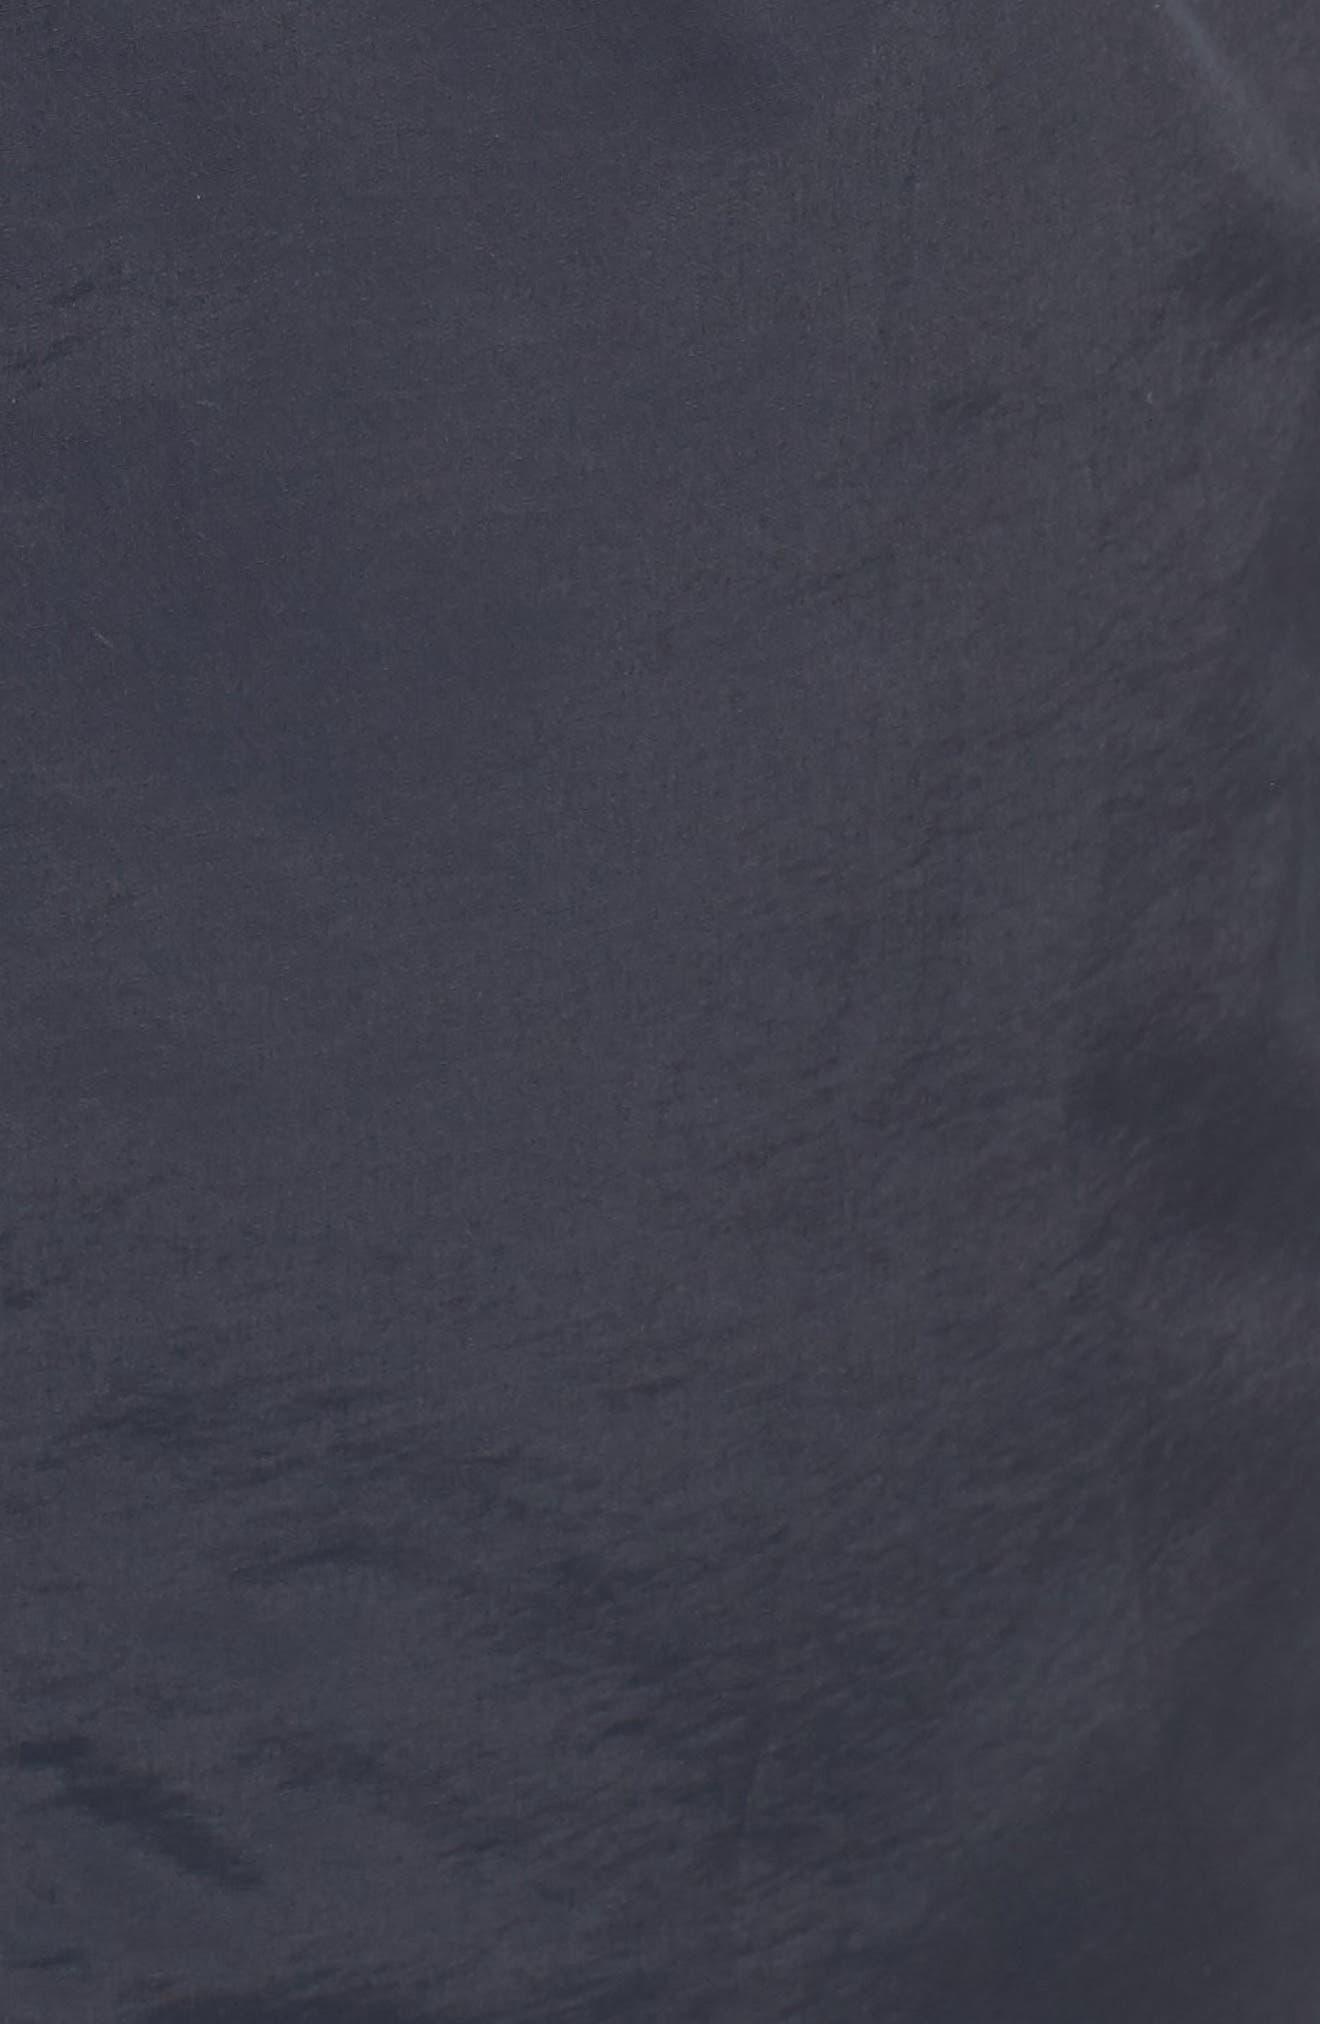 Hooded Fleece Lined Raincoat,                             Alternate thumbnail 5, color,                             Marine Navy